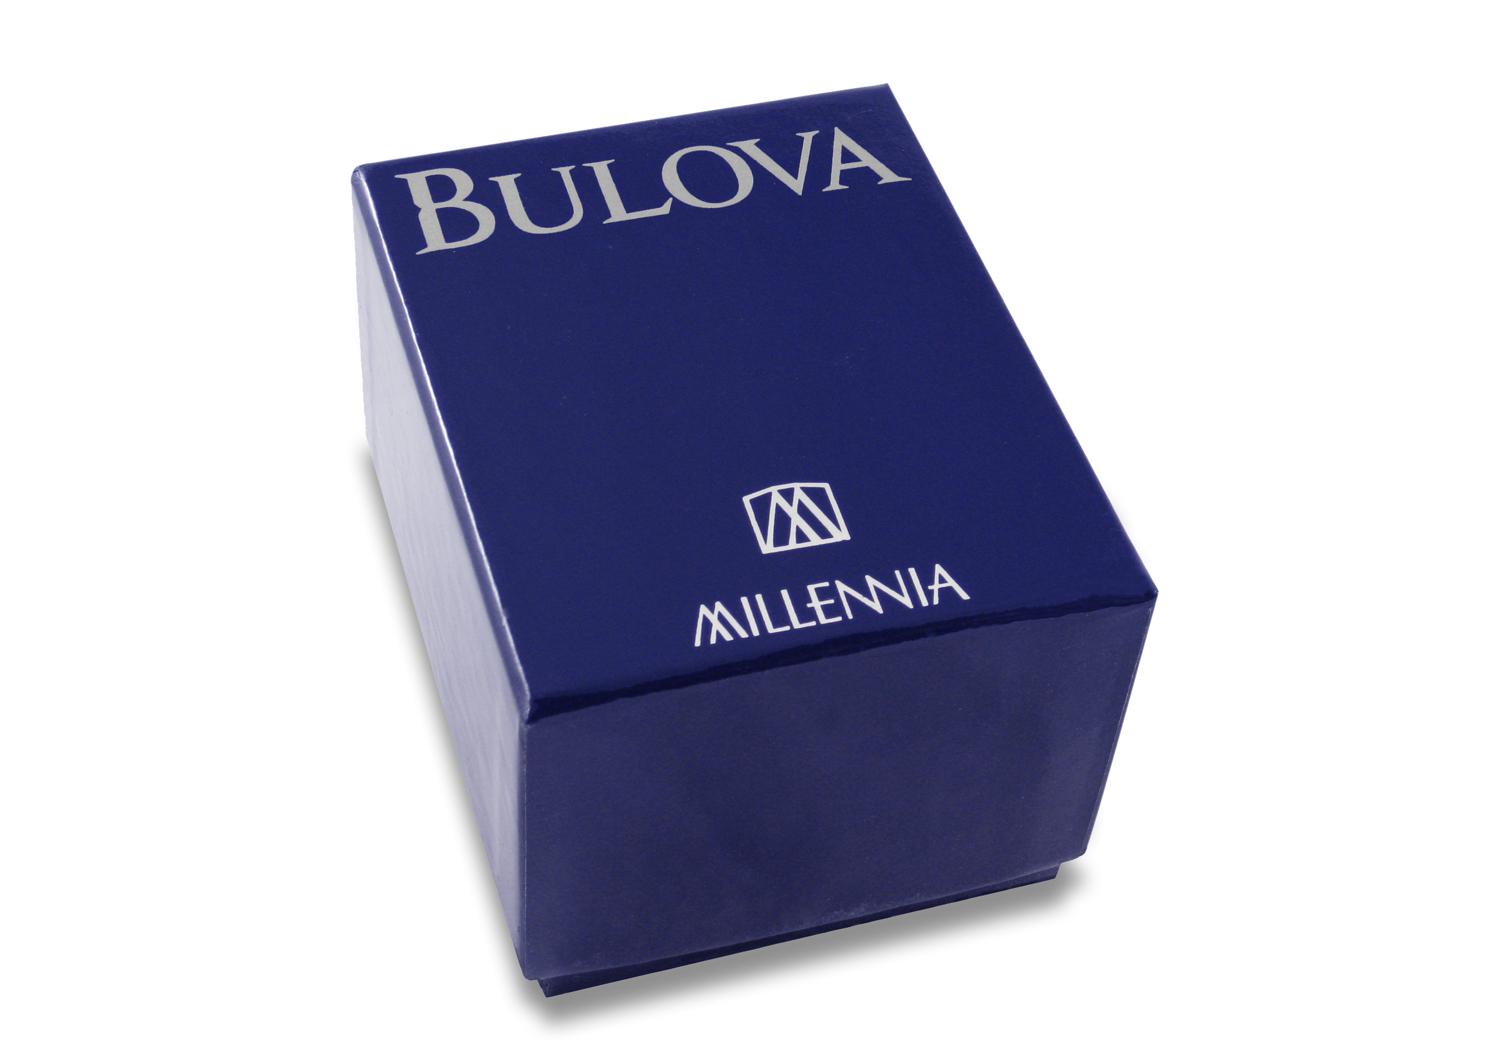 Bulova Millennia Watch Box